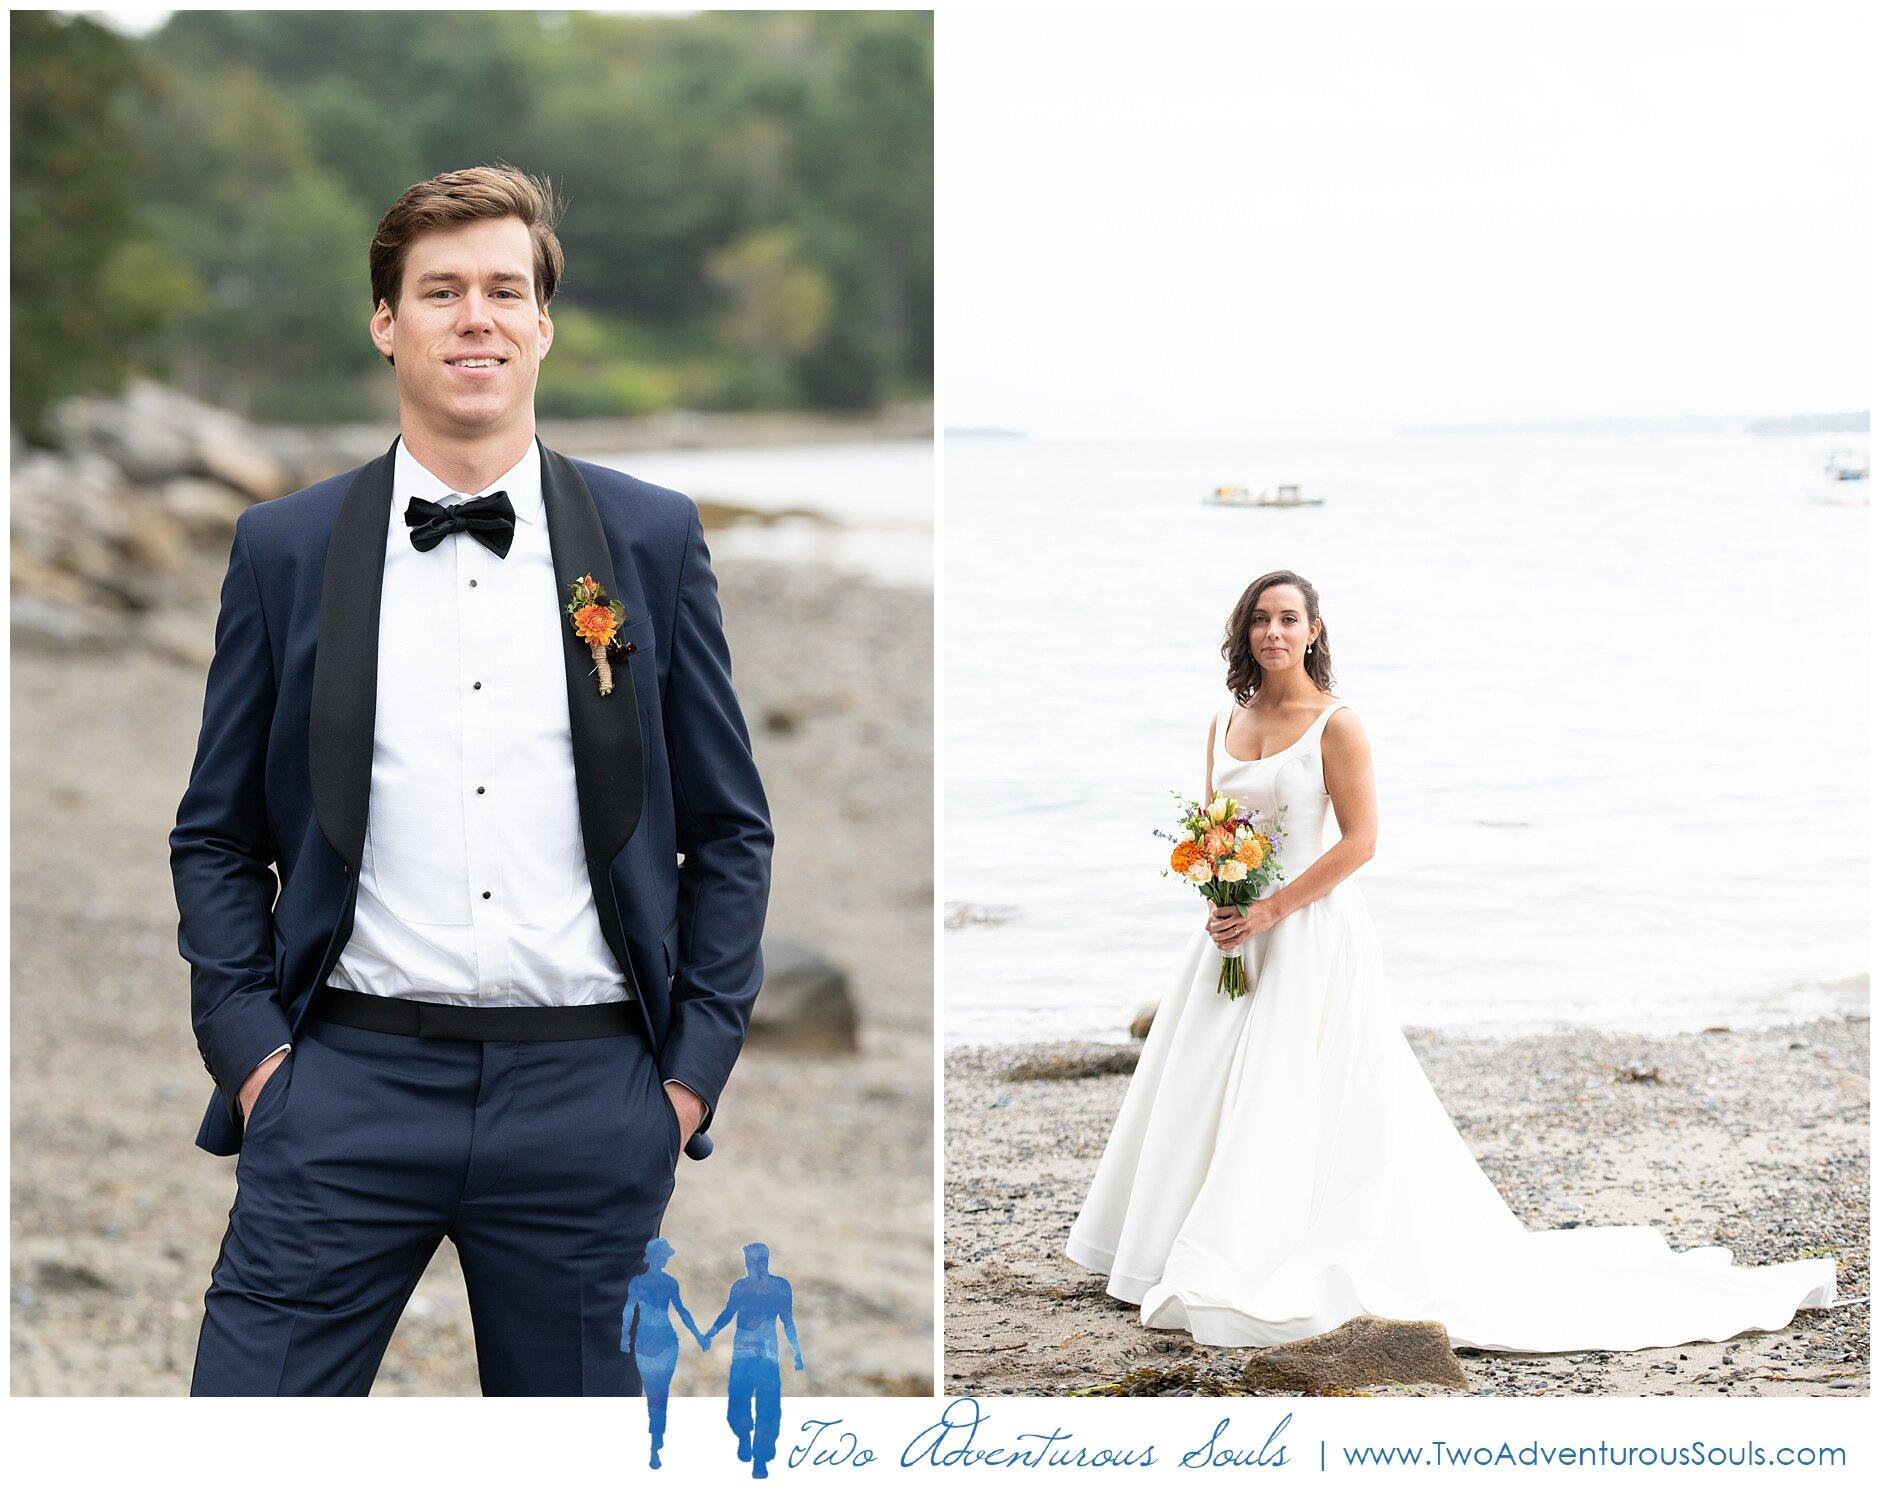 Bar Harbor Wedding Photographers, Acadia Bay Inn Wedding Photographers, Two Adventurous Souls- 091419_0010.jpg